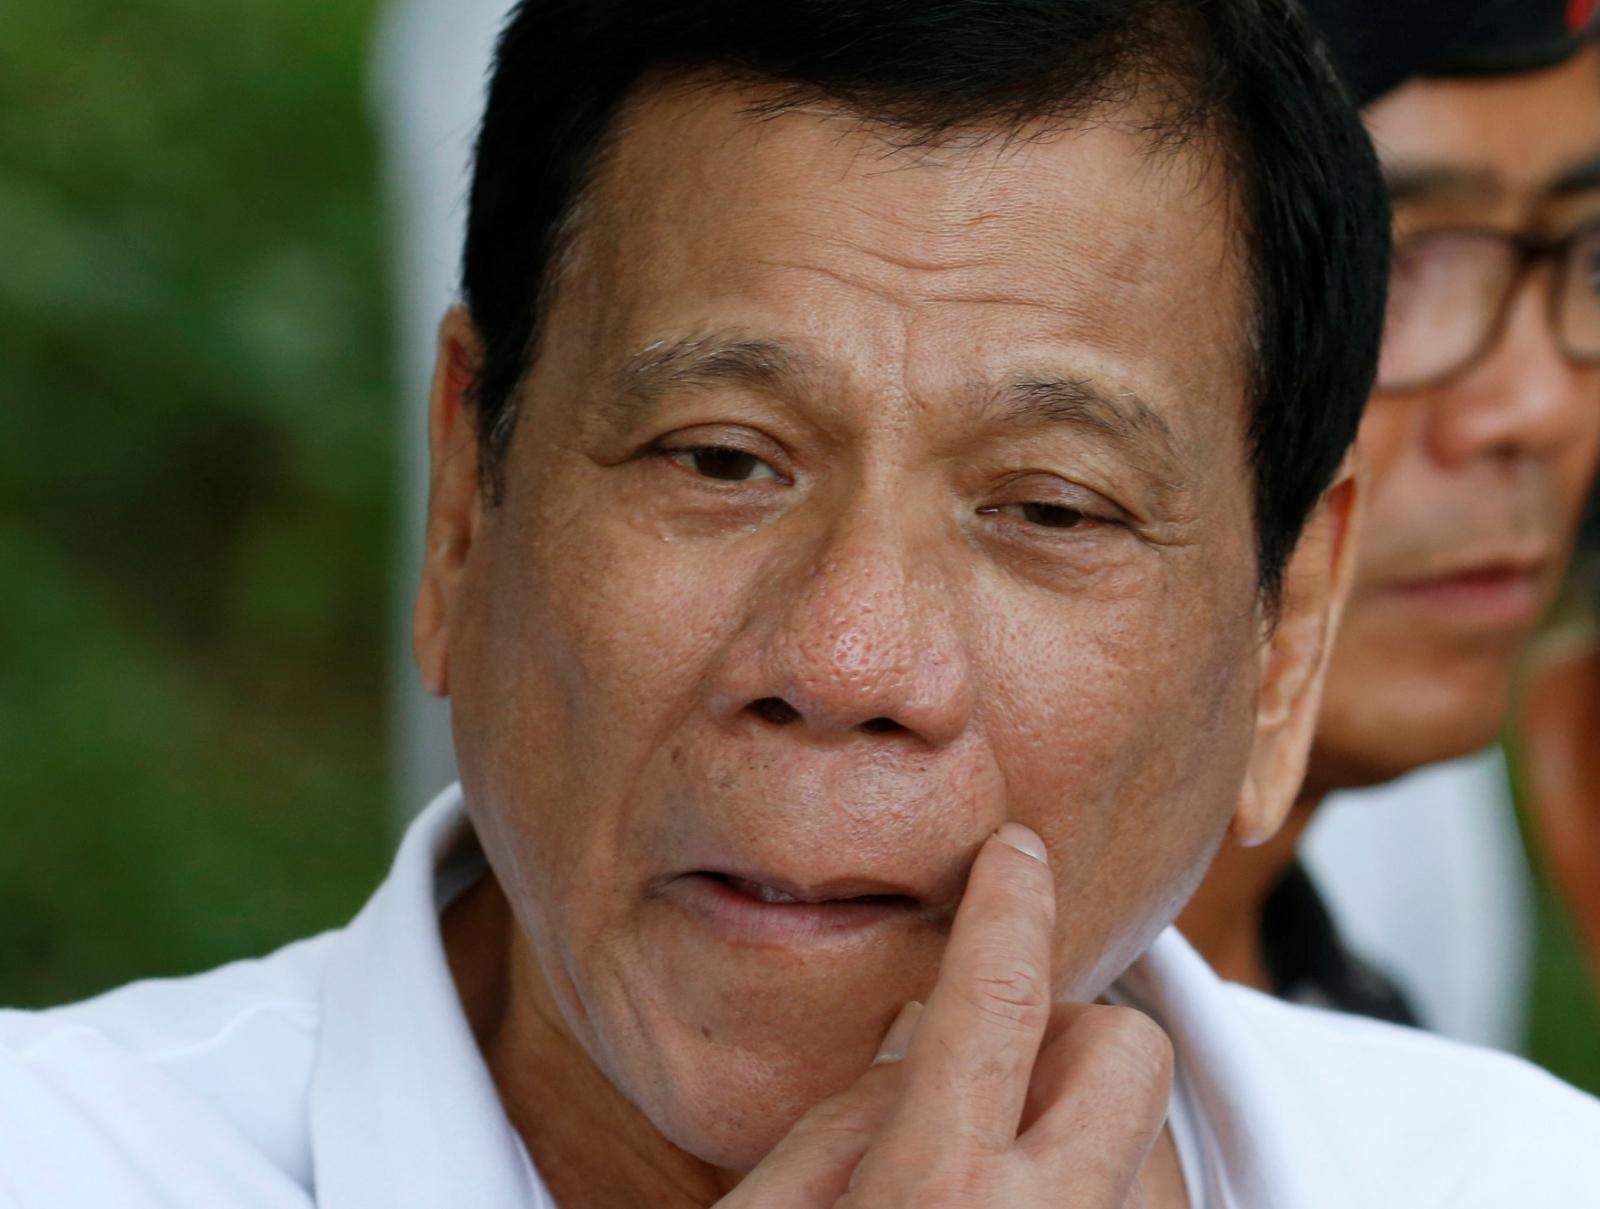 Duterte 'ordered murders' in Davao City, senators told